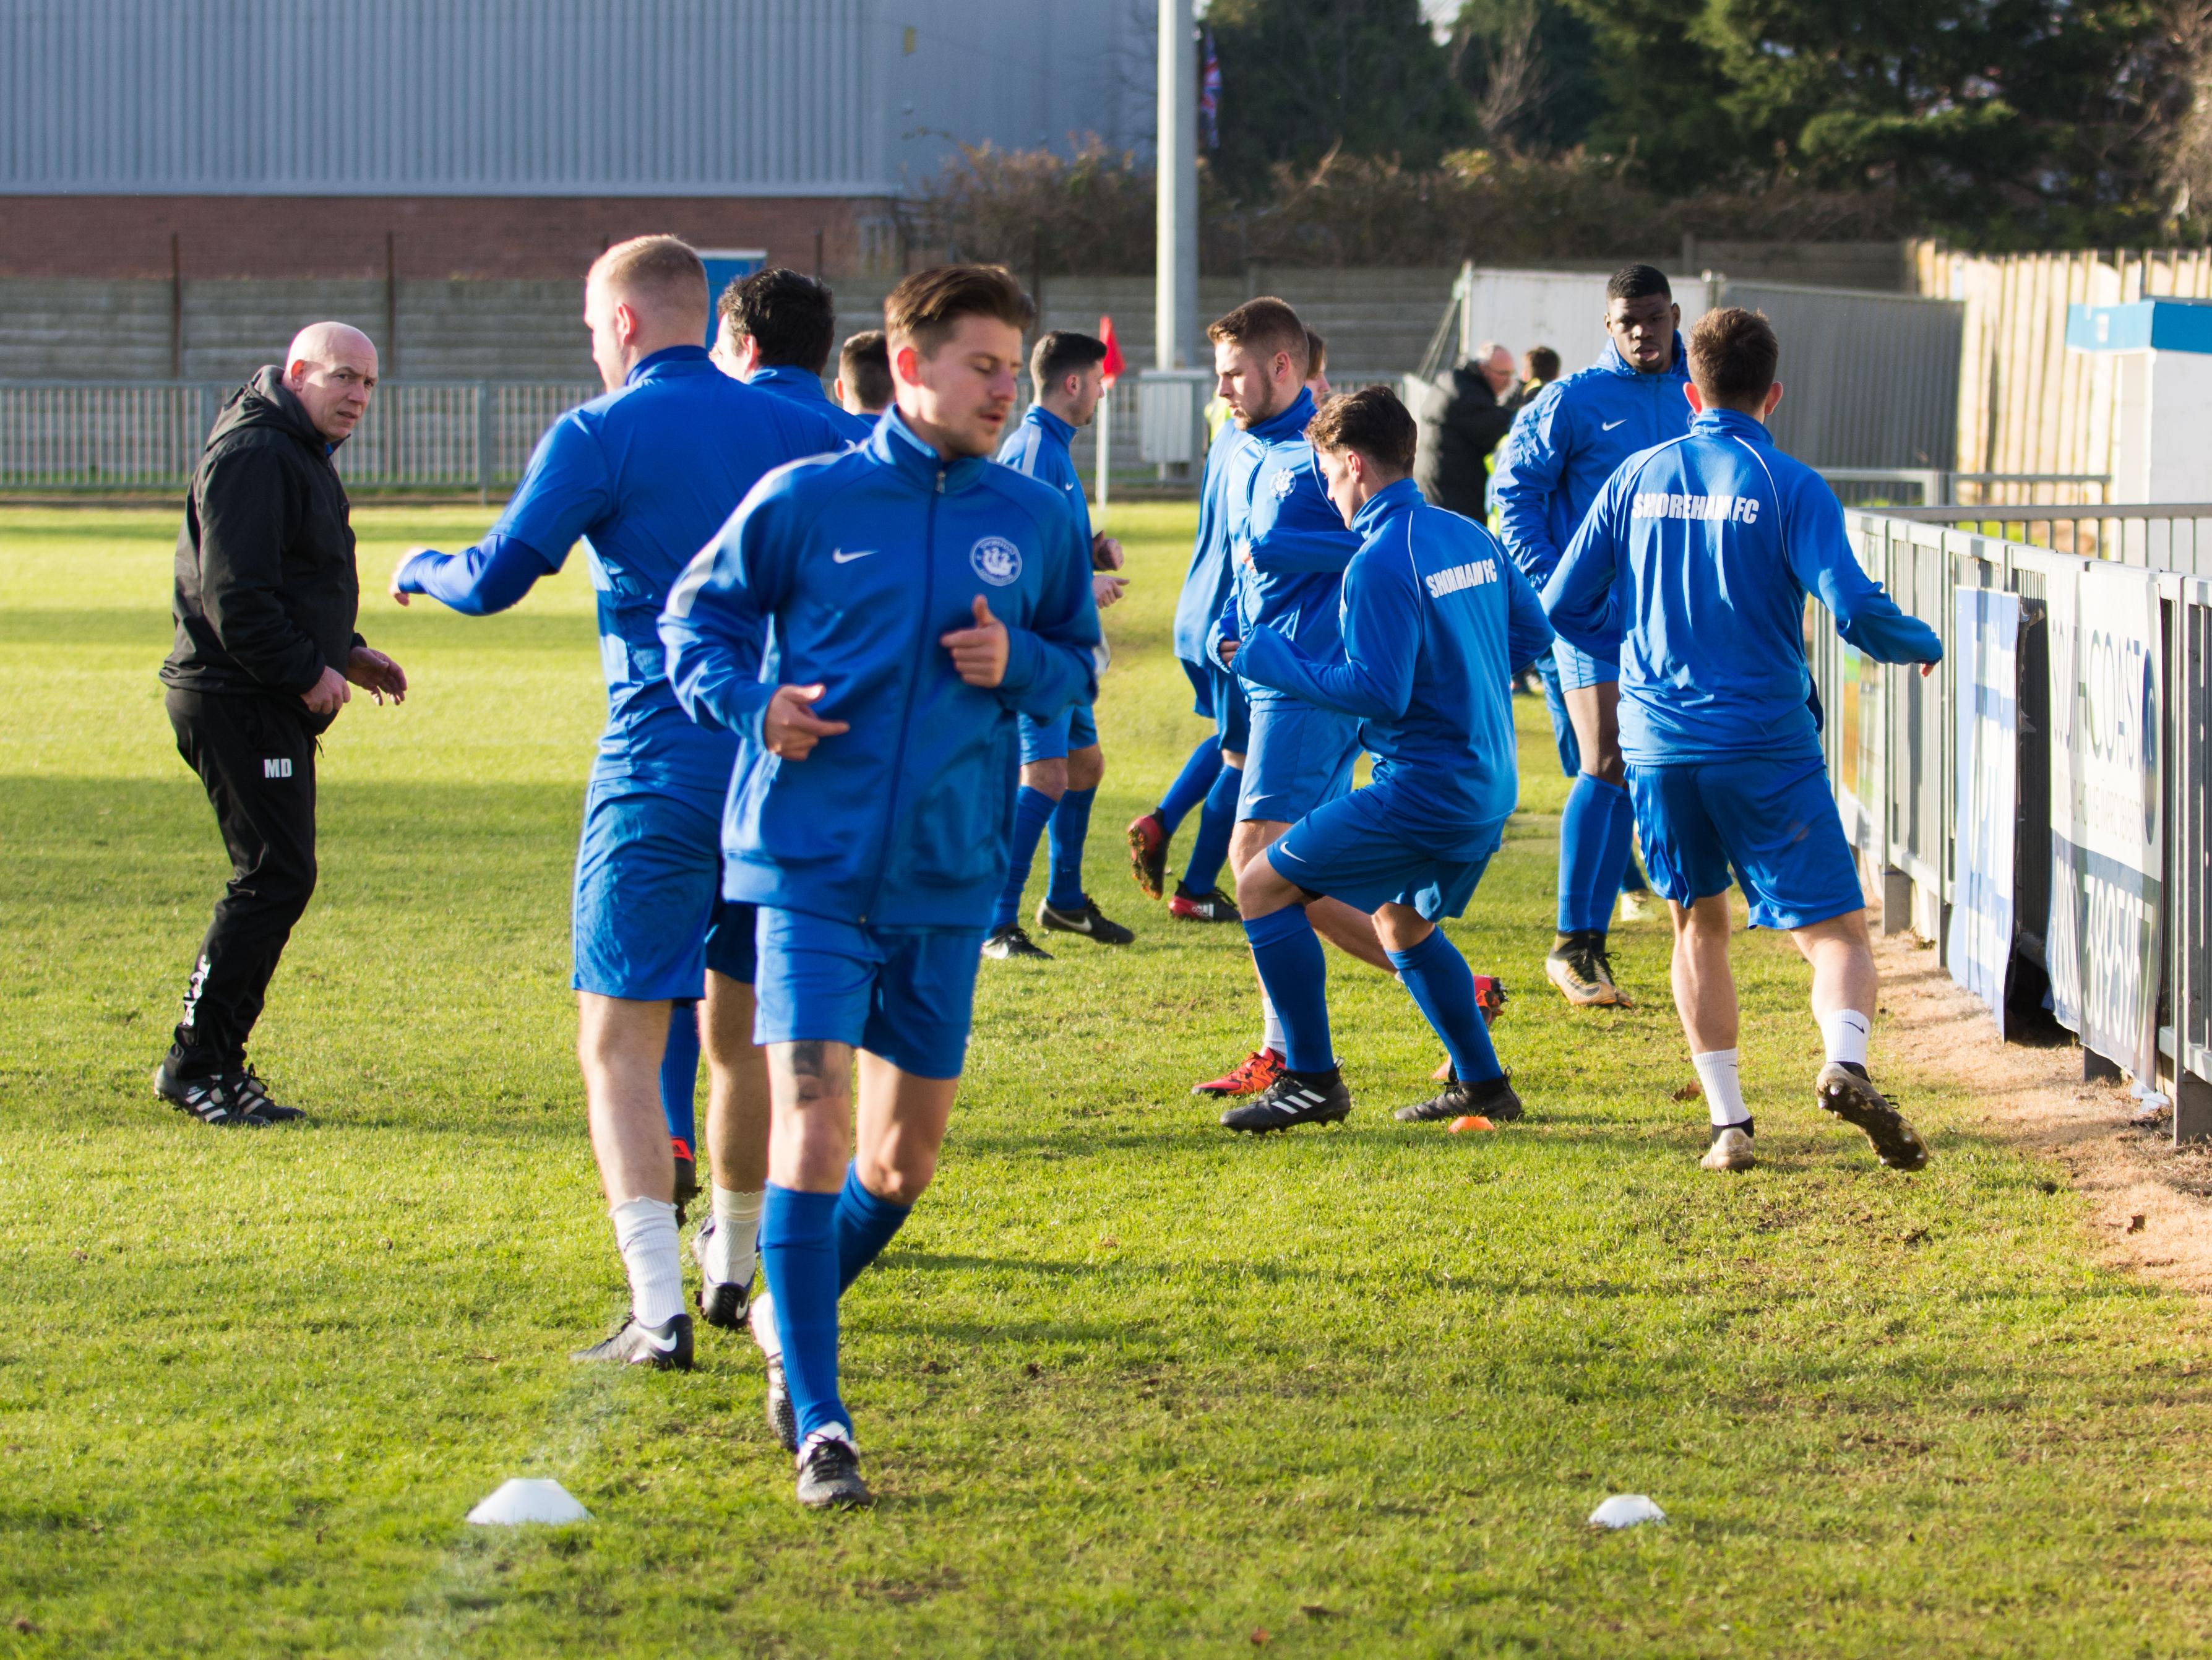 Shoreham FC vs Molesey FC 02.12.17 01